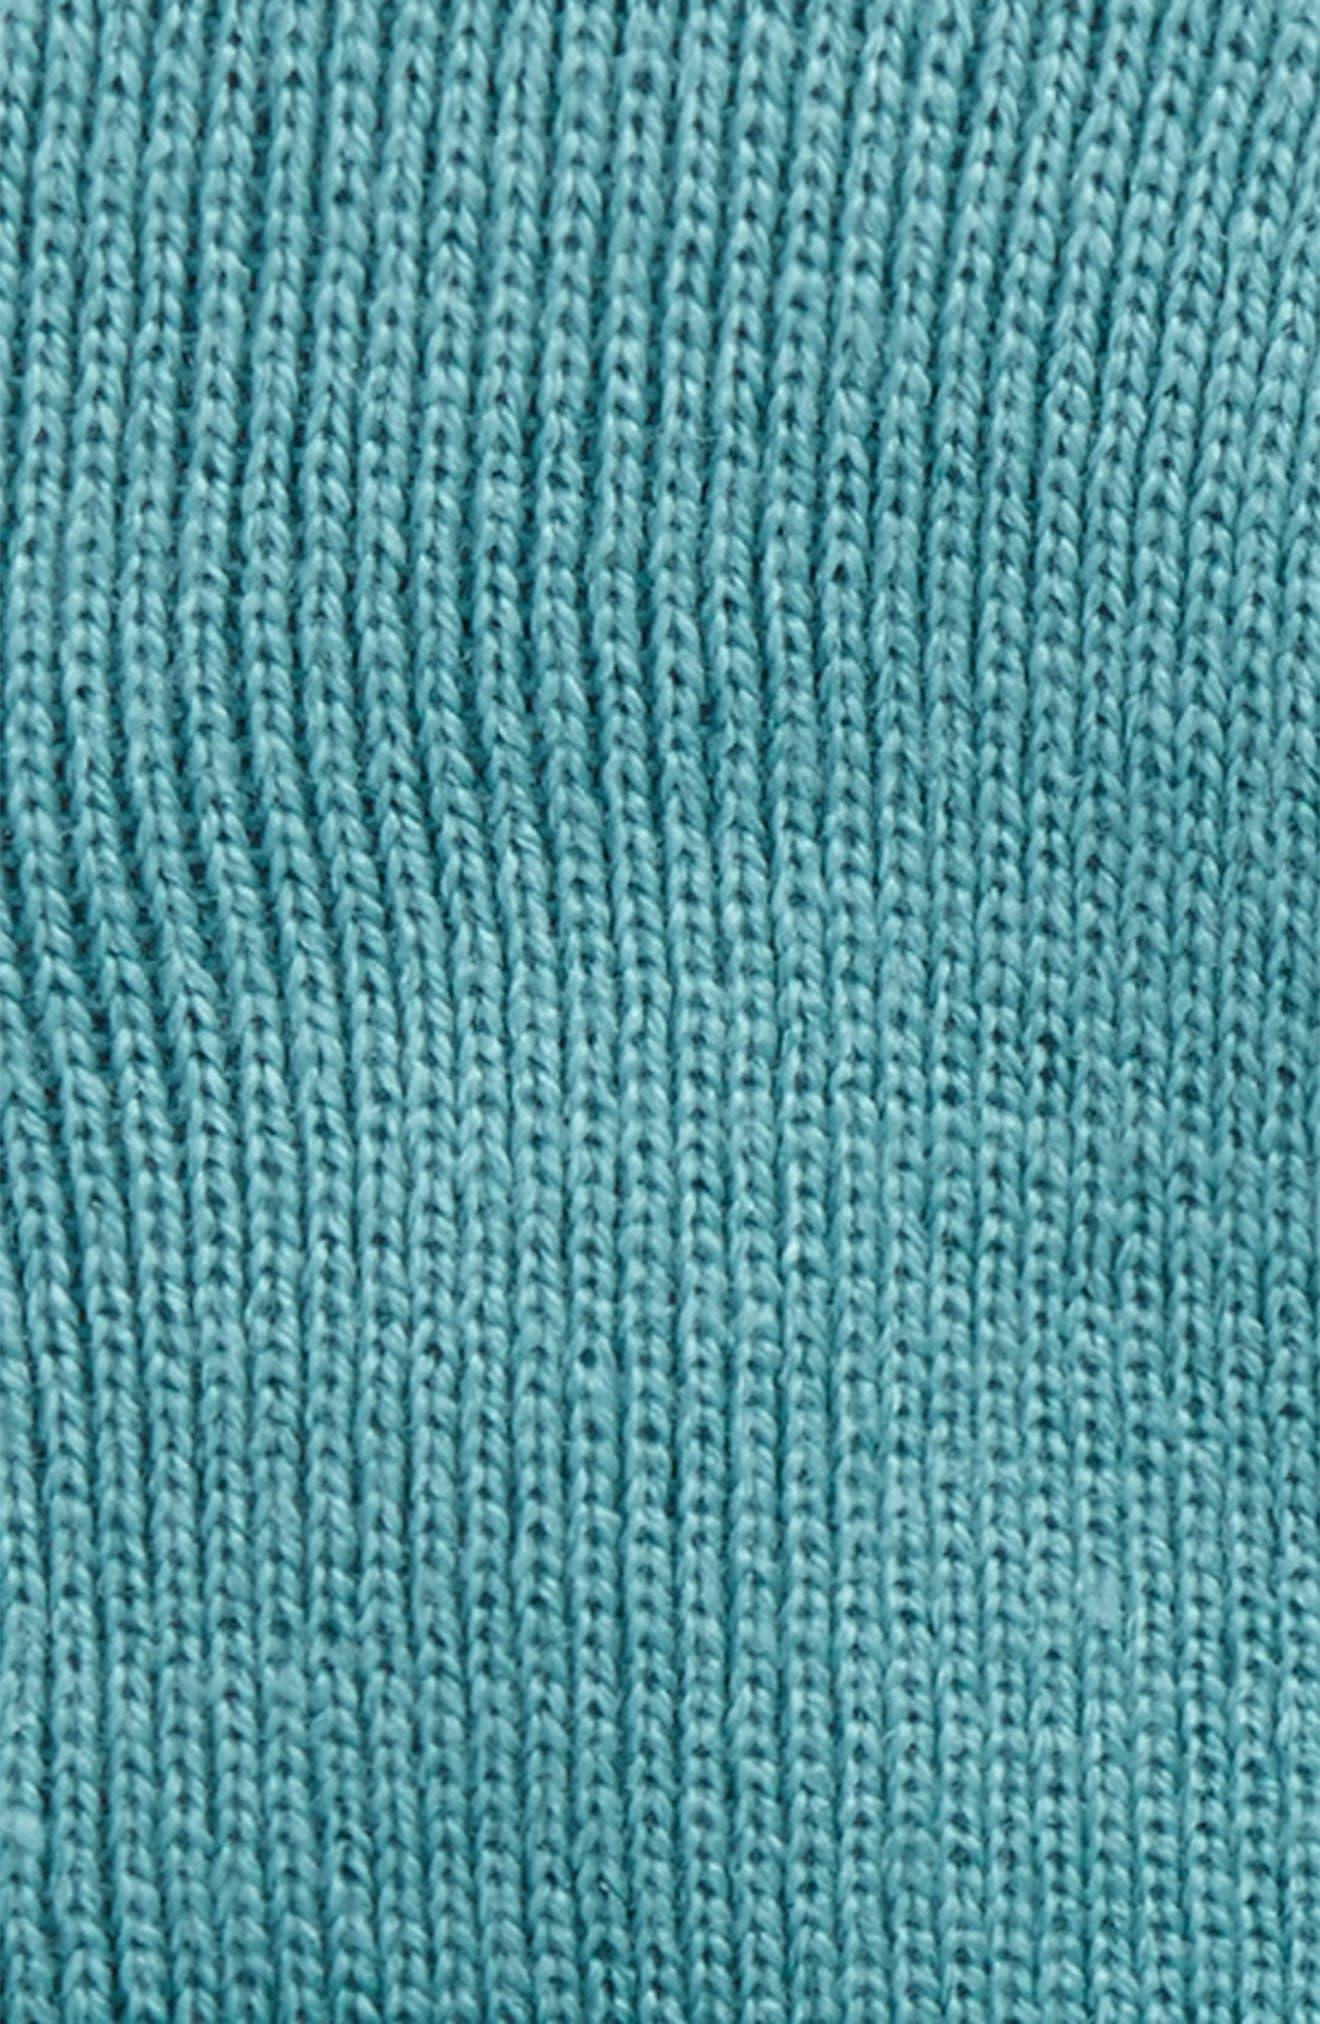 Madison Beanie,                             Alternate thumbnail 2, color,                             71590-Soft Teal/White